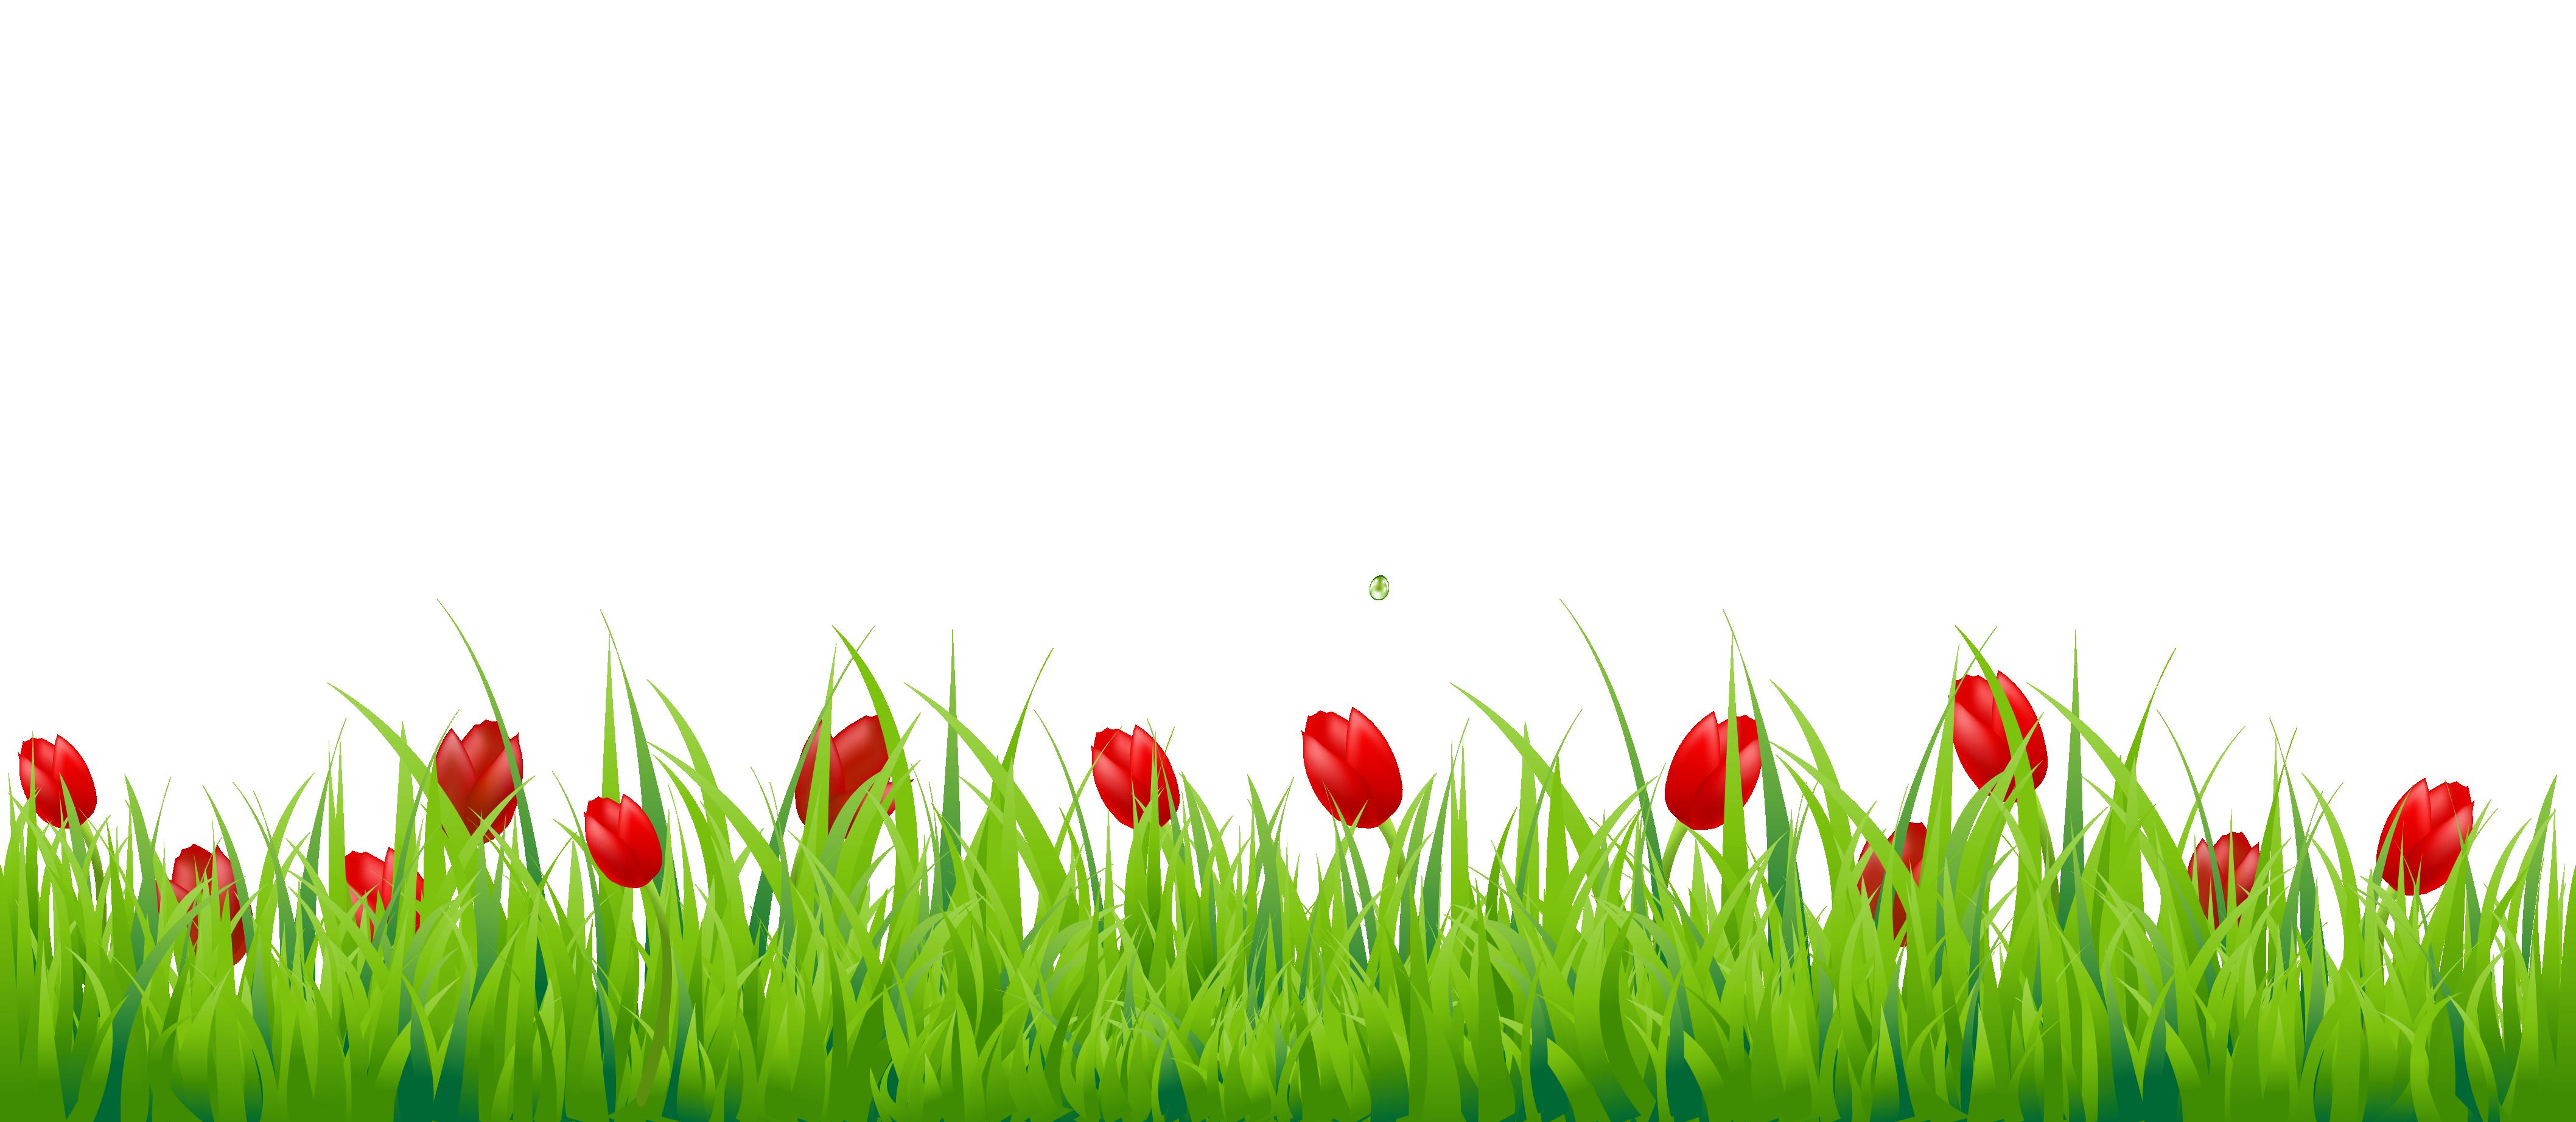 Flower clipart png transparent image freeuse download Rose Grass PNG Transparent Image Flower image freeuse download